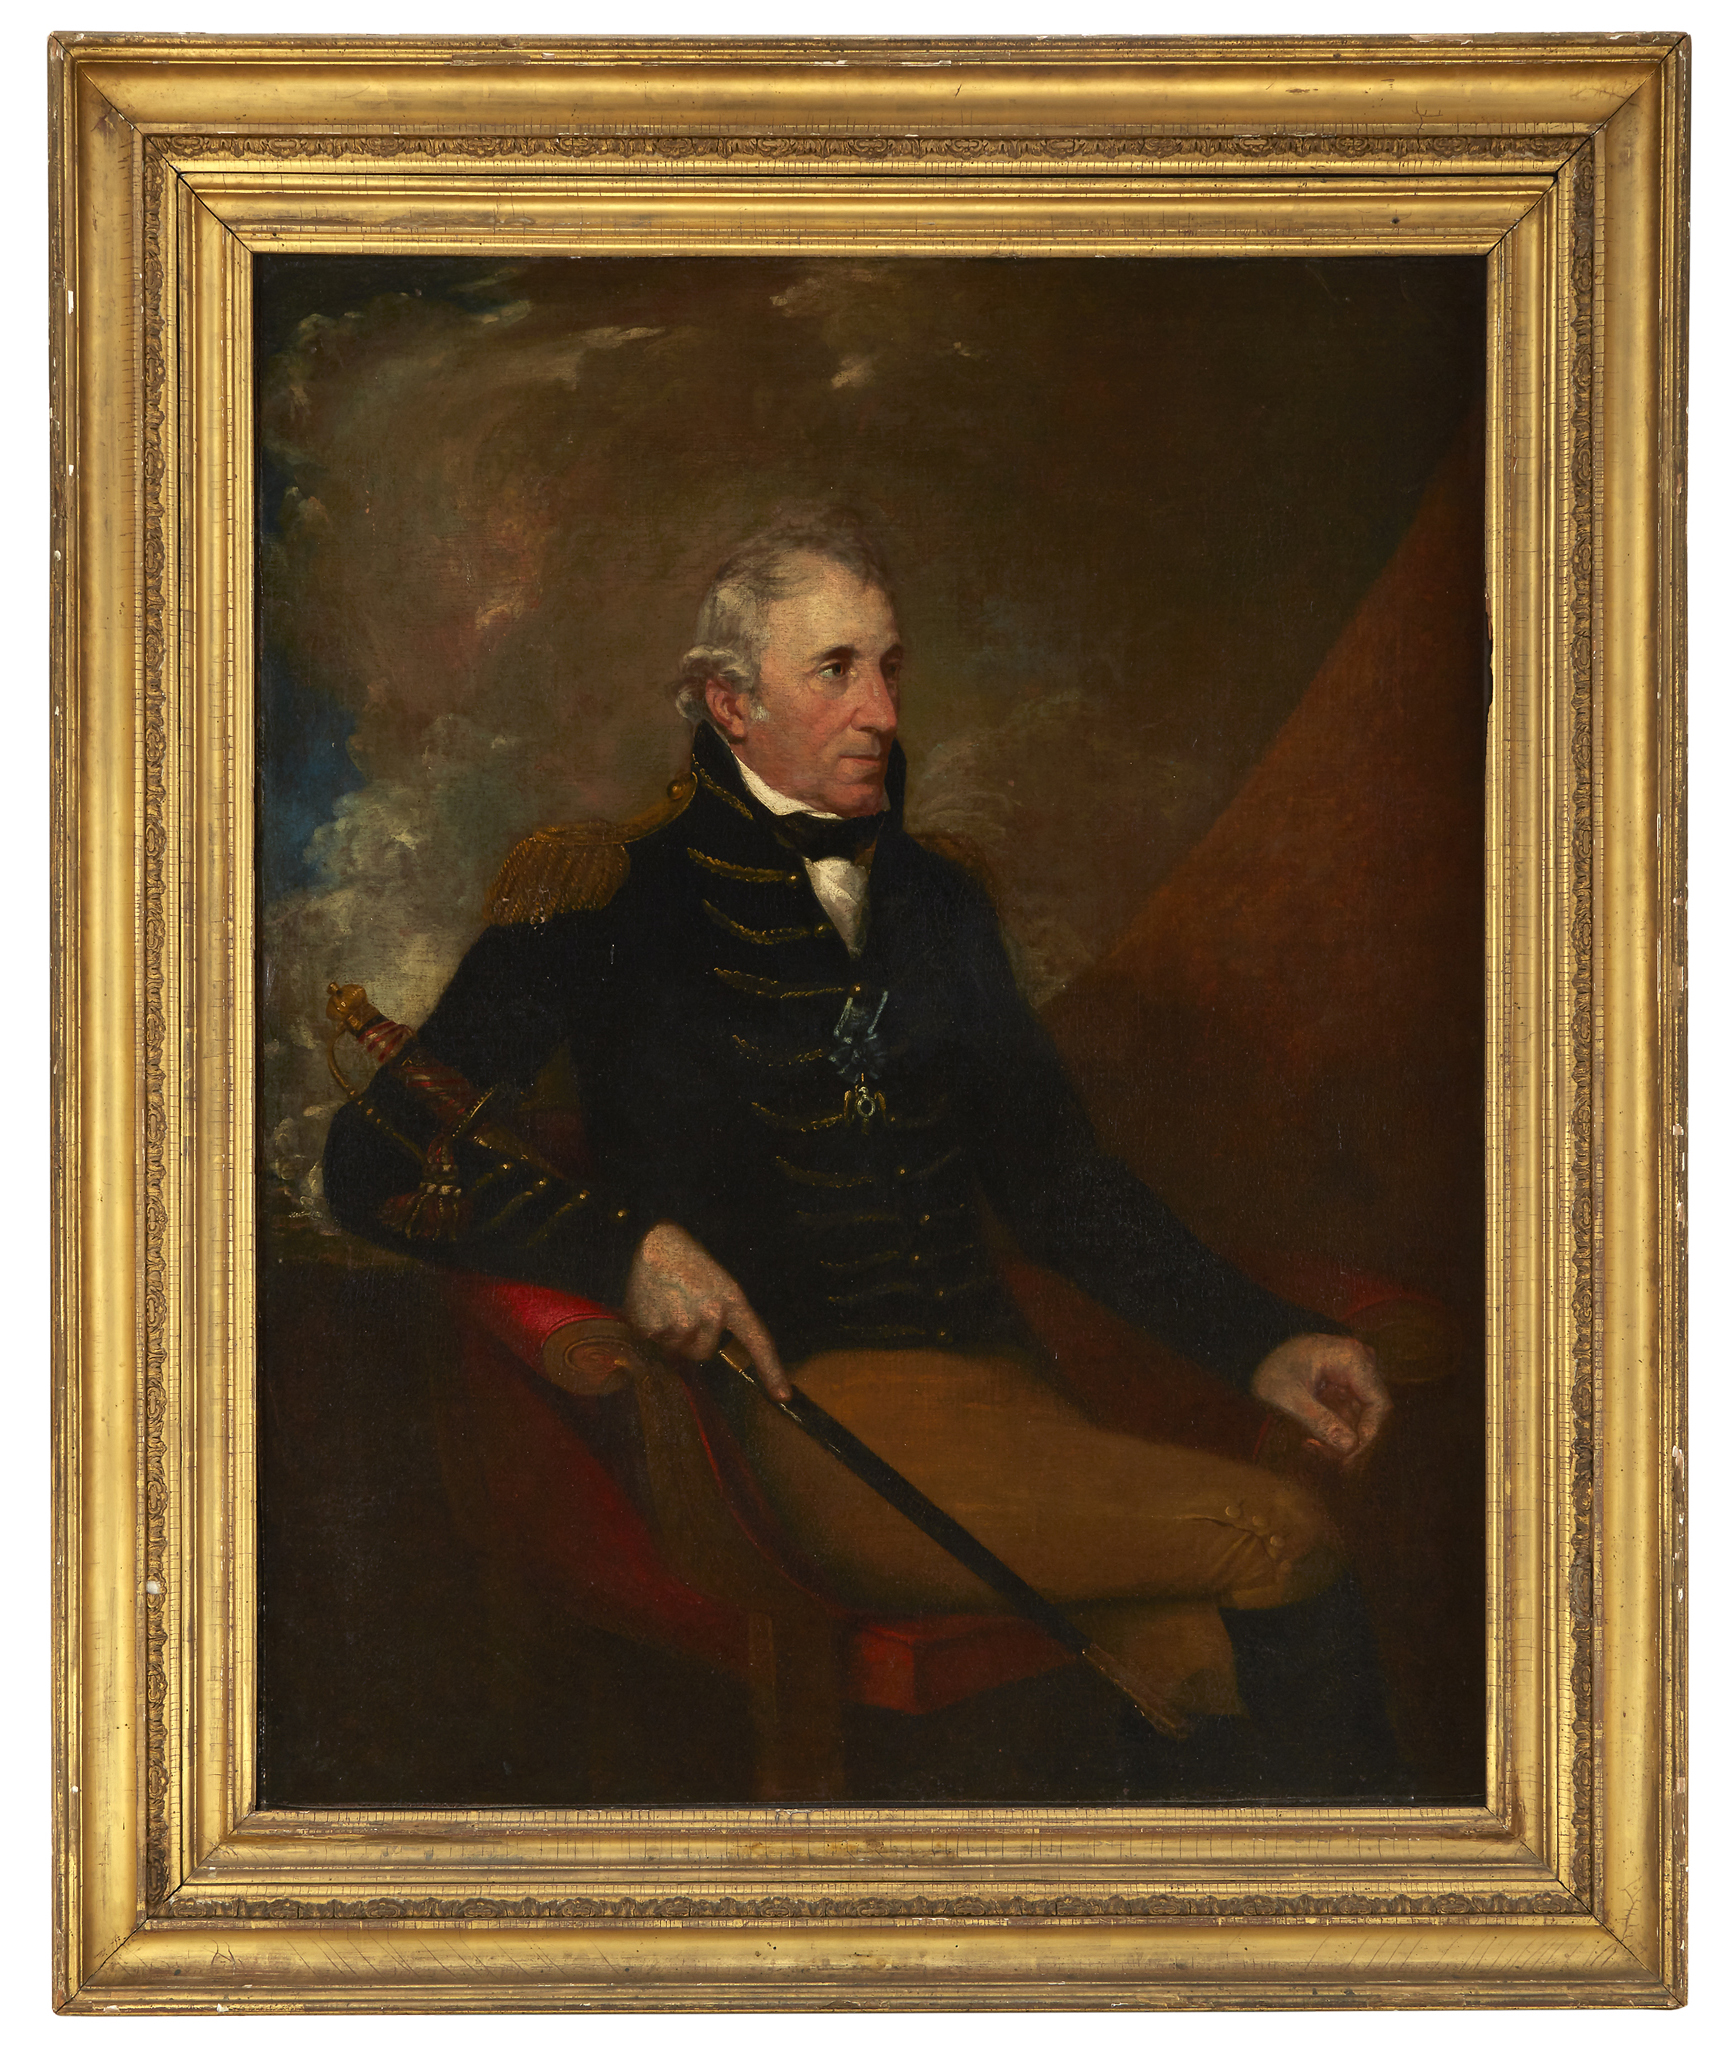 Thomas Pinckney by Samuel F.B. Morse, 1818